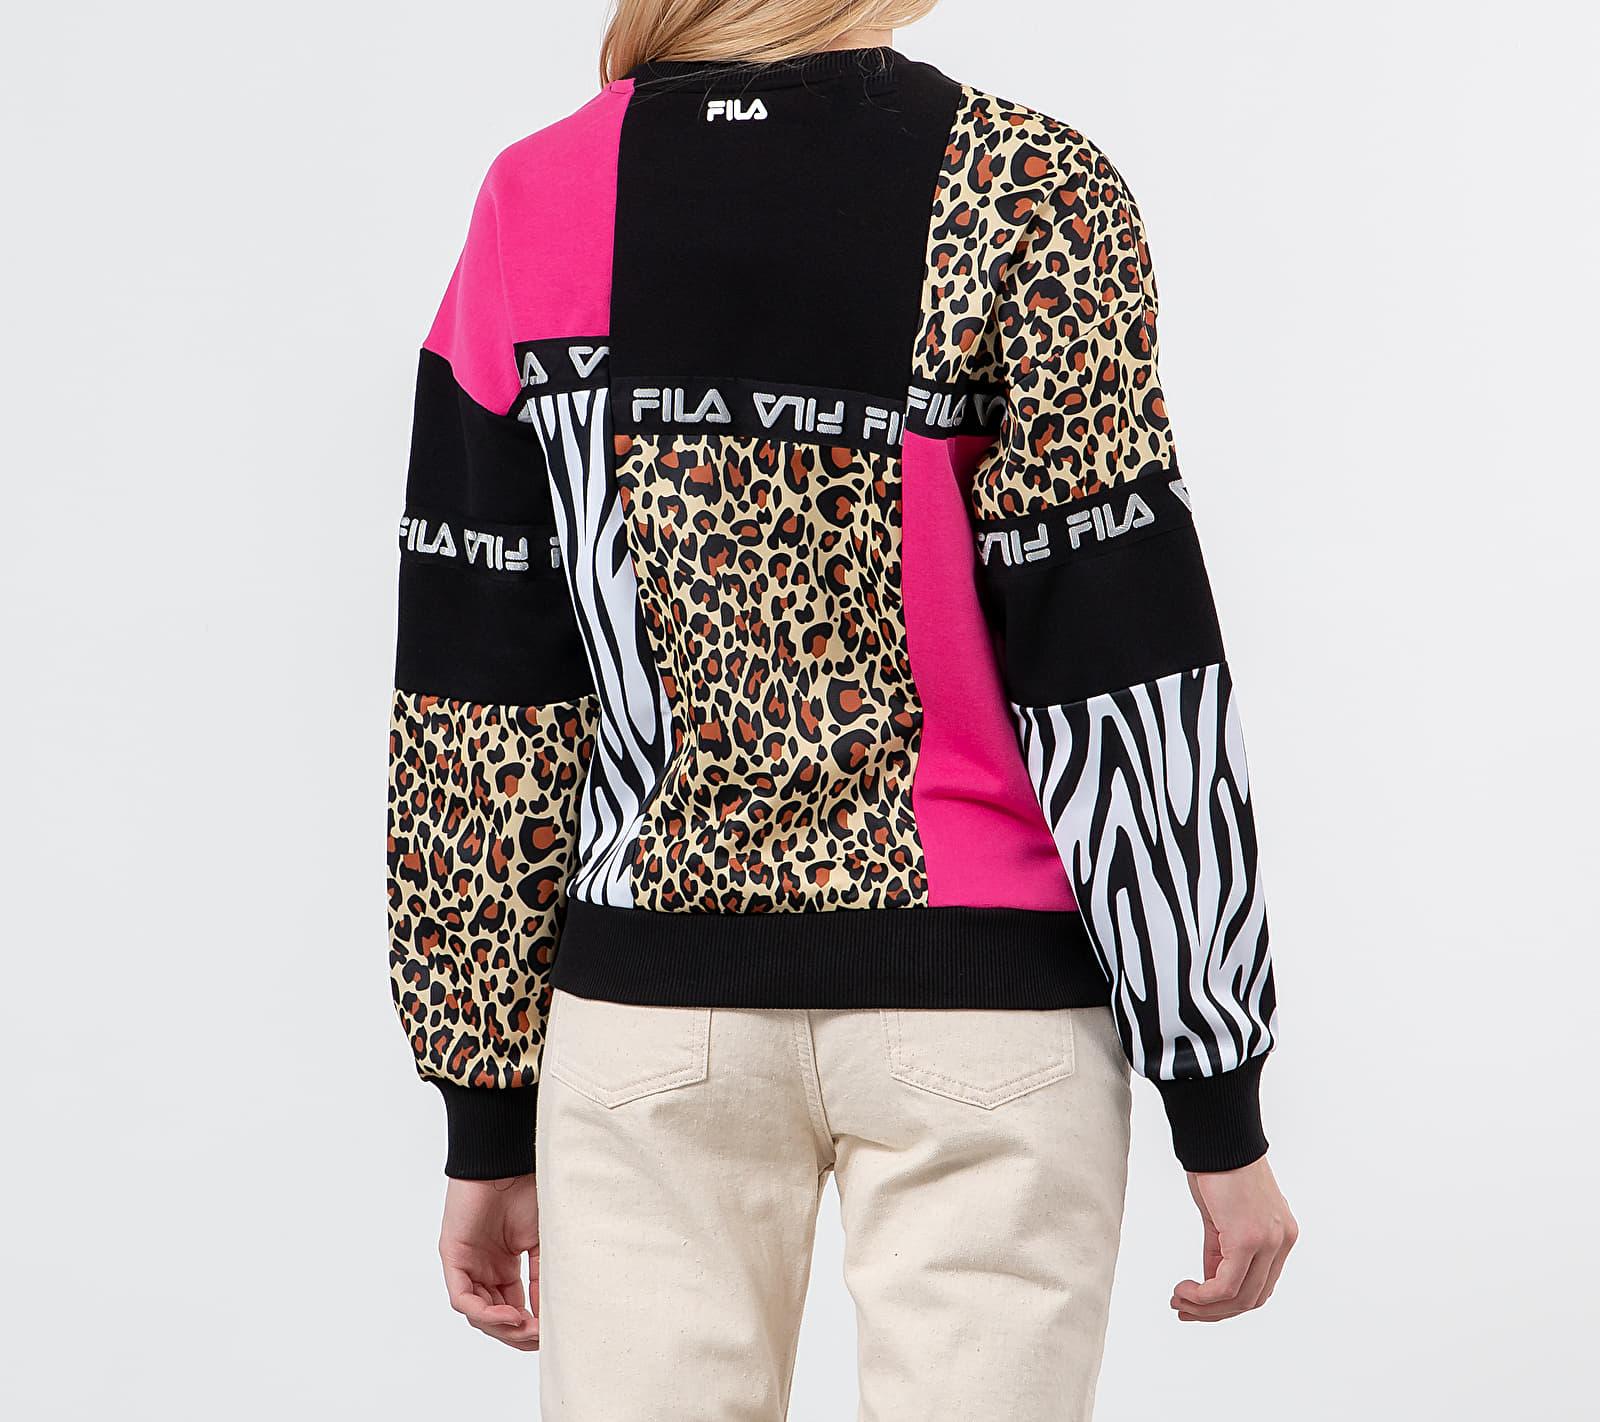 FILA Papina Crewneck Black/ Pink/ Leo, Multicolour